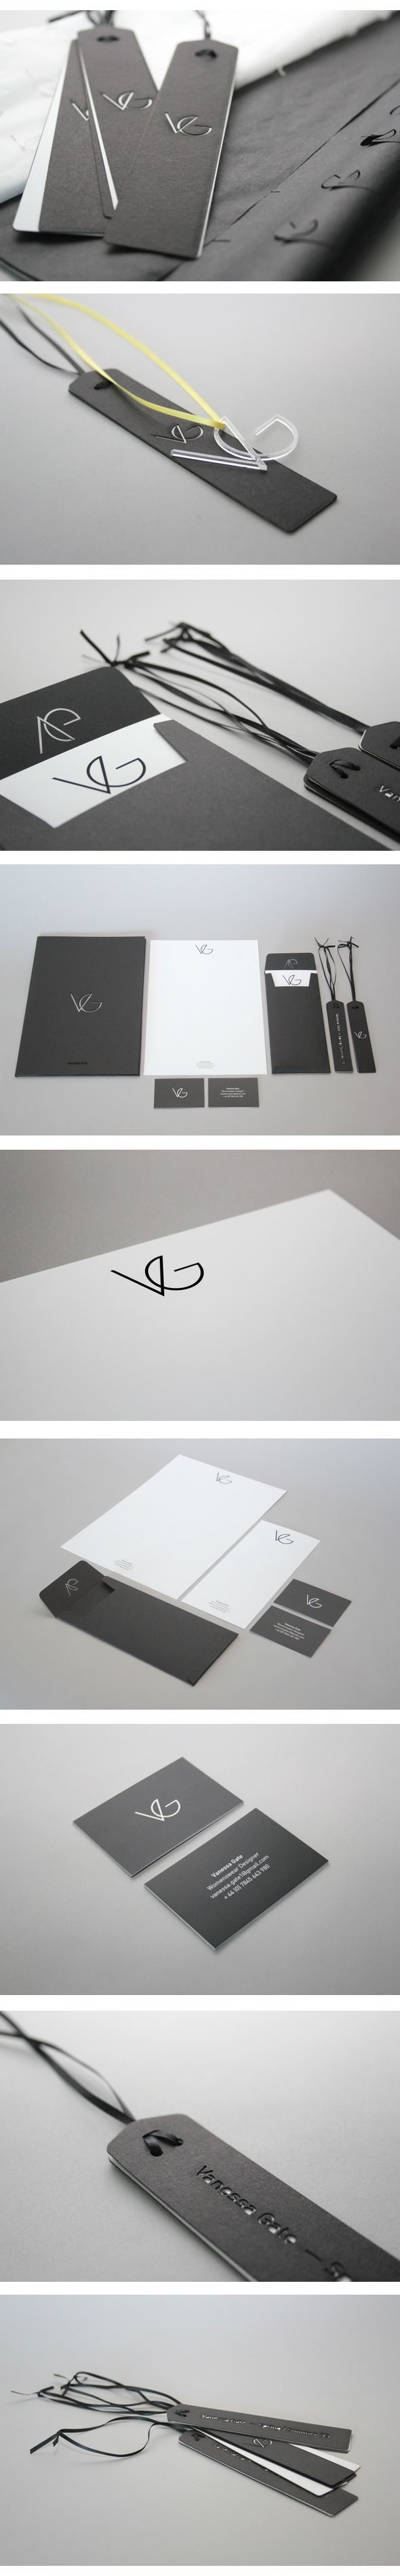 Vanessa Gate. Womenswear Designer Brand Identity by Jonathan Finch via Behance | #stationary #corporate #design #corporatedesign #identity #branding #marketing < repinned by www.BlickeDeeler.de | Visit our website: www.blickedeeler.de/leistungen/corporate-design